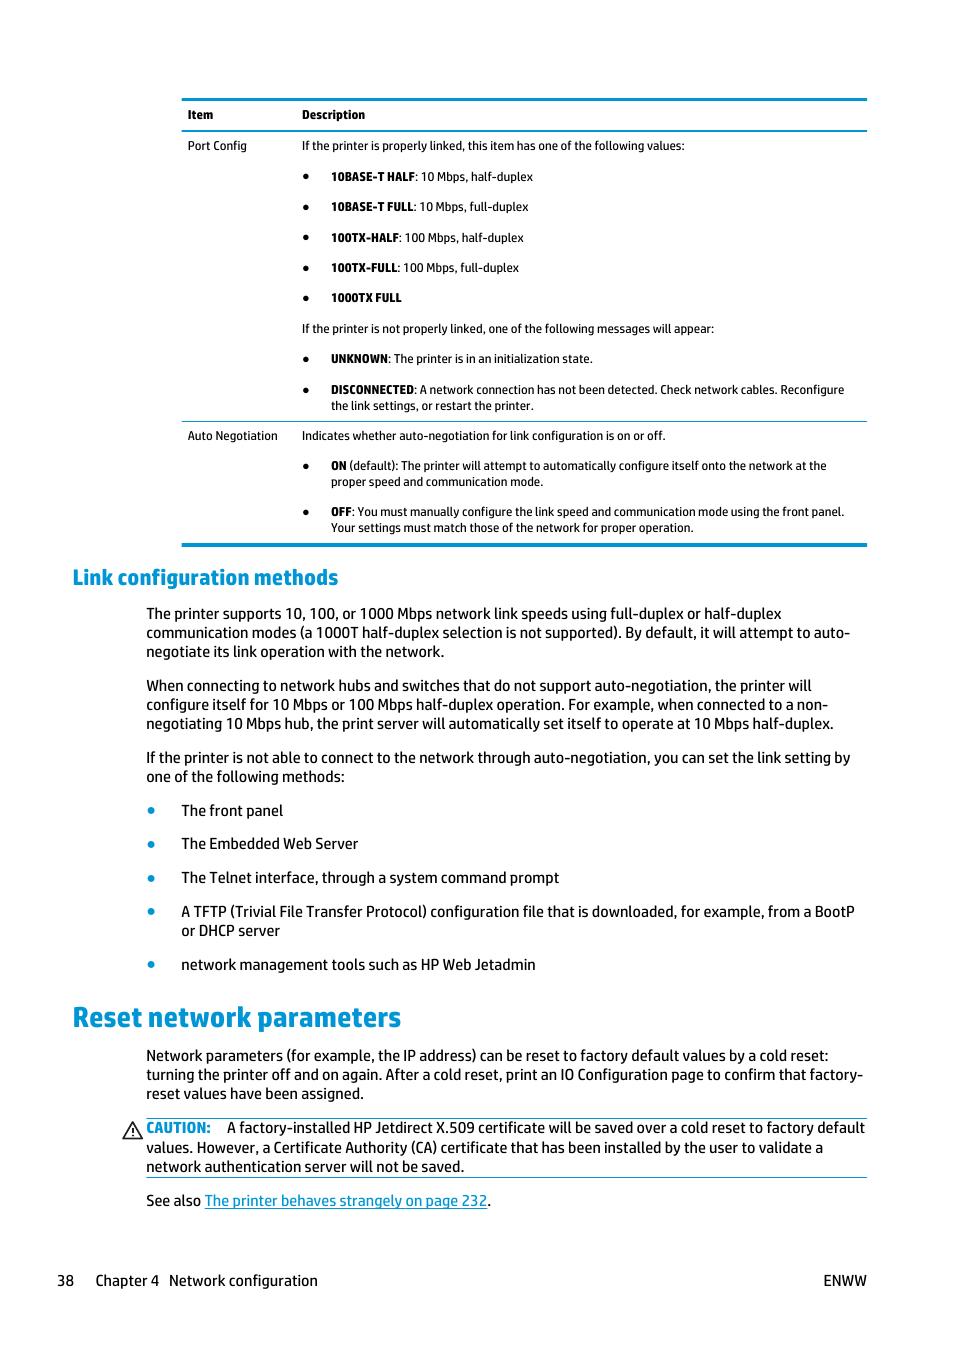 Link configuration methods, Reset network parameters | HP